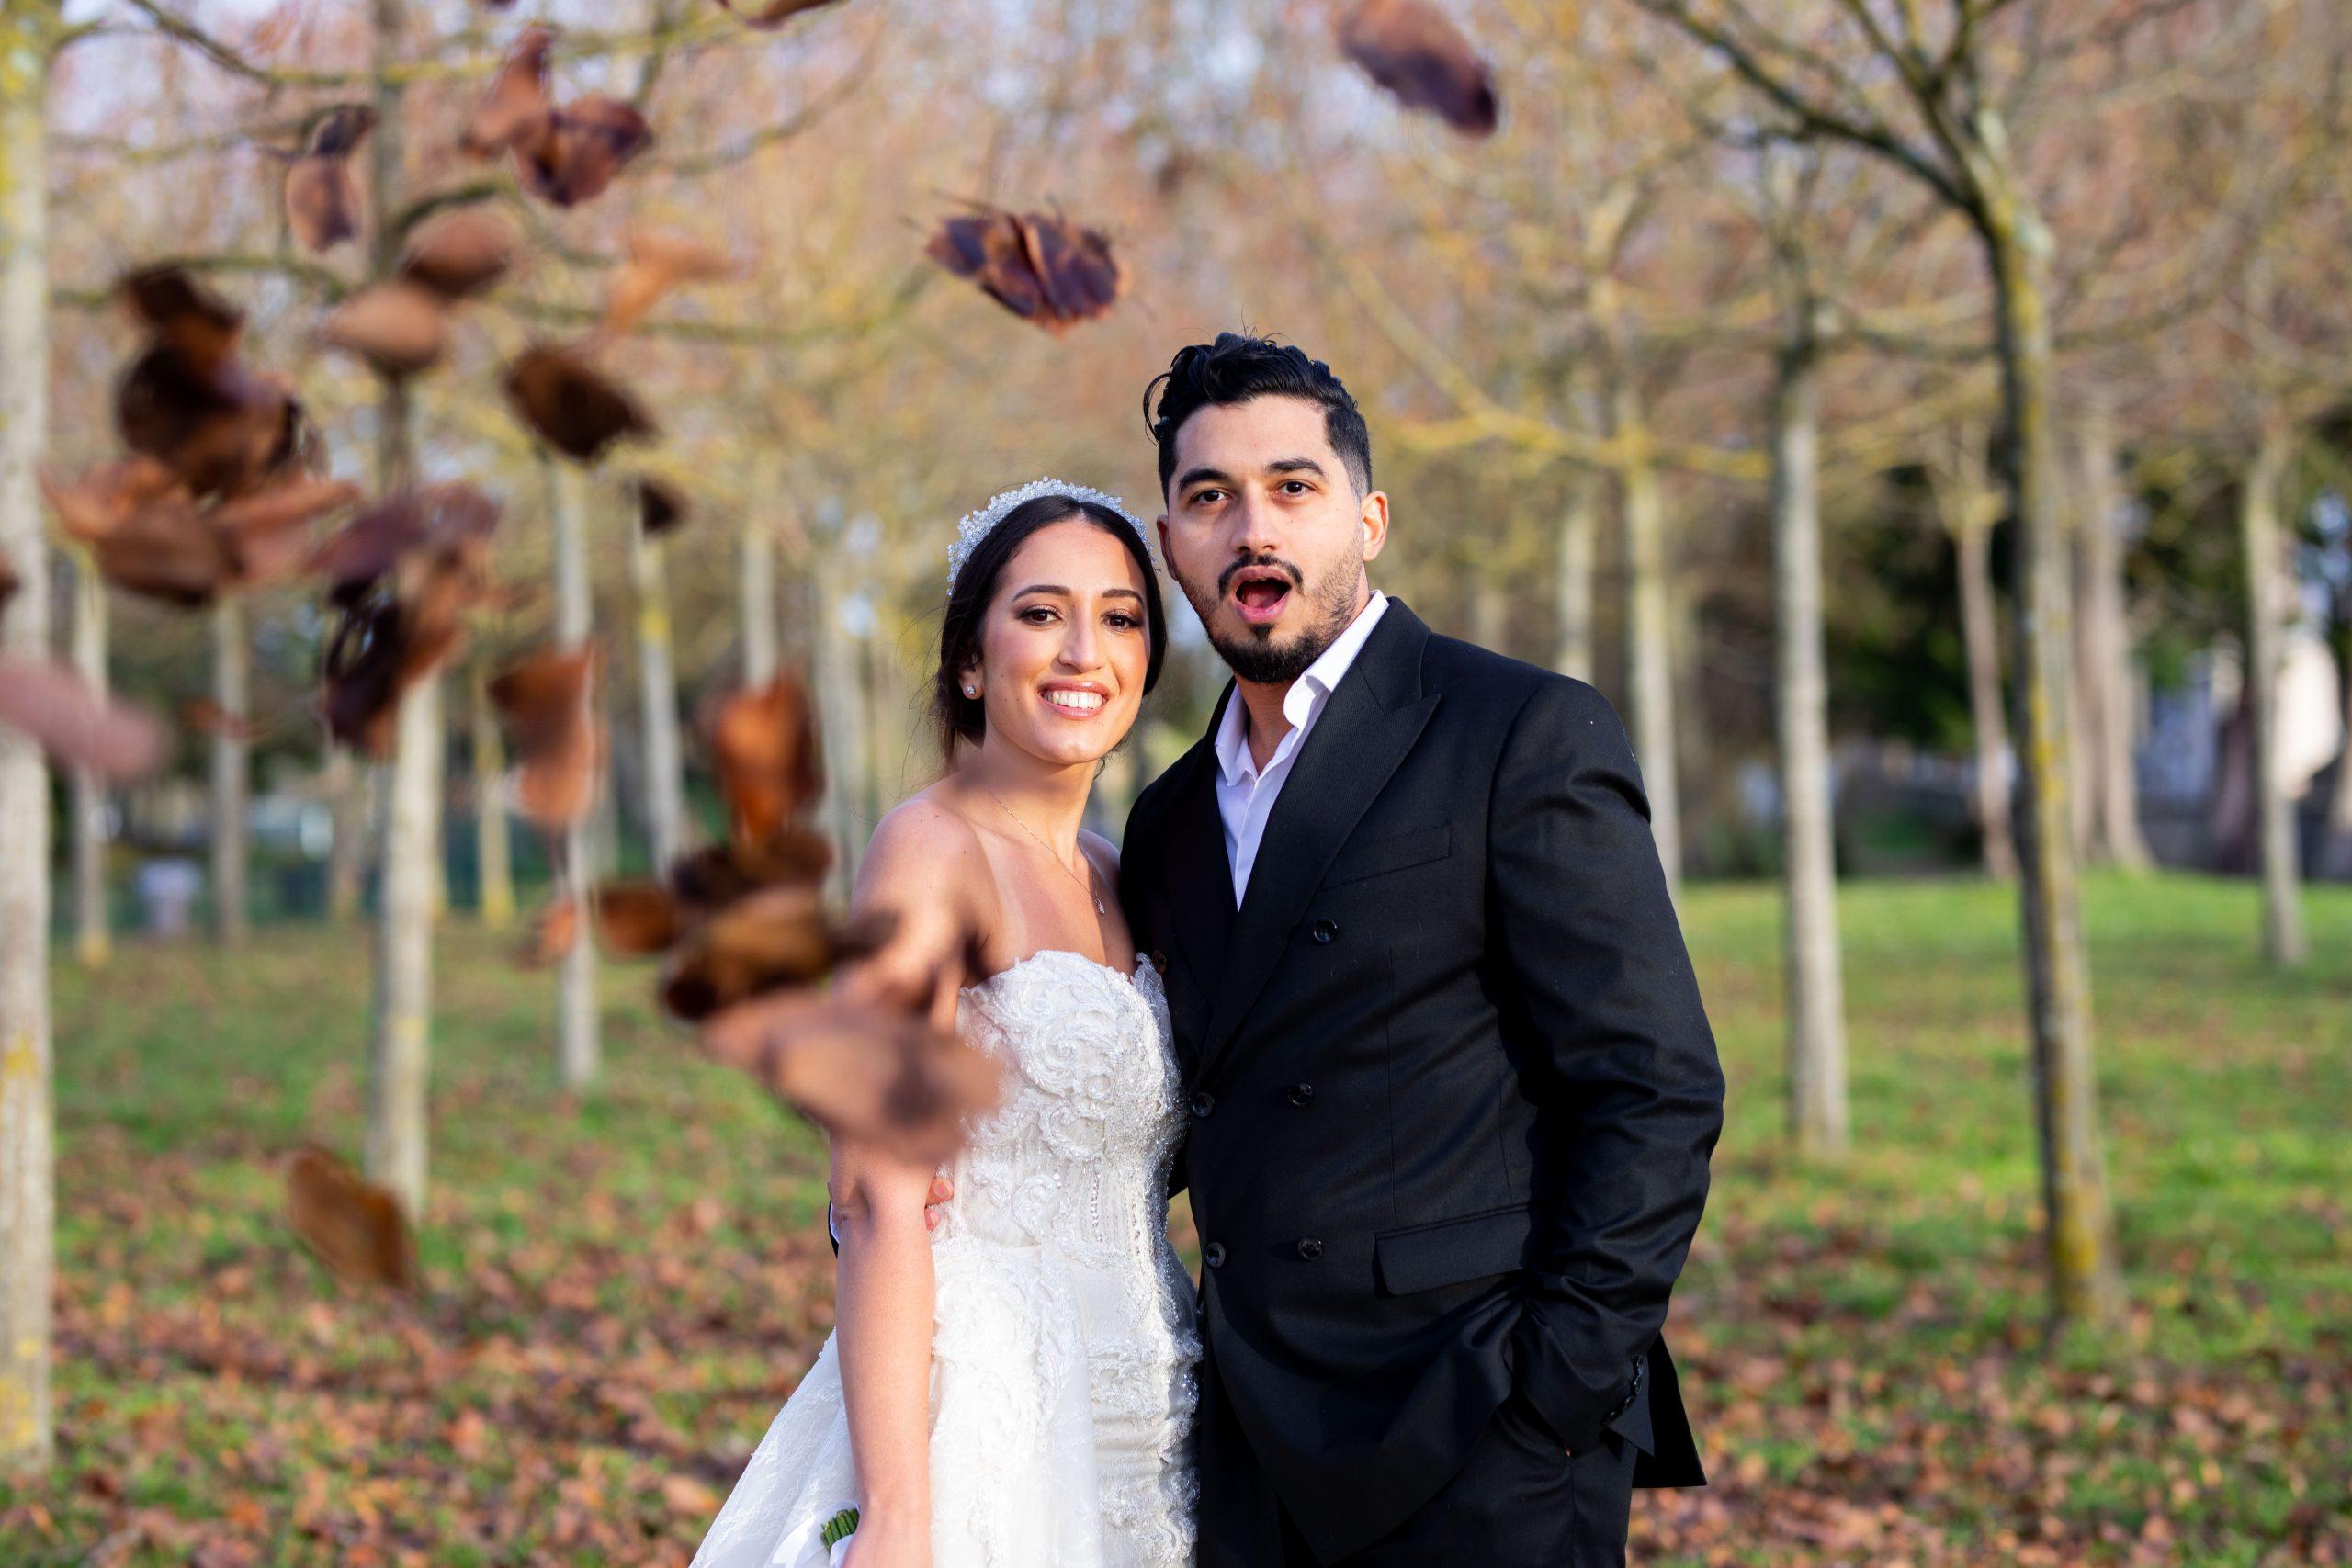 Photographe mariage Conflans-Sainte-Honorine